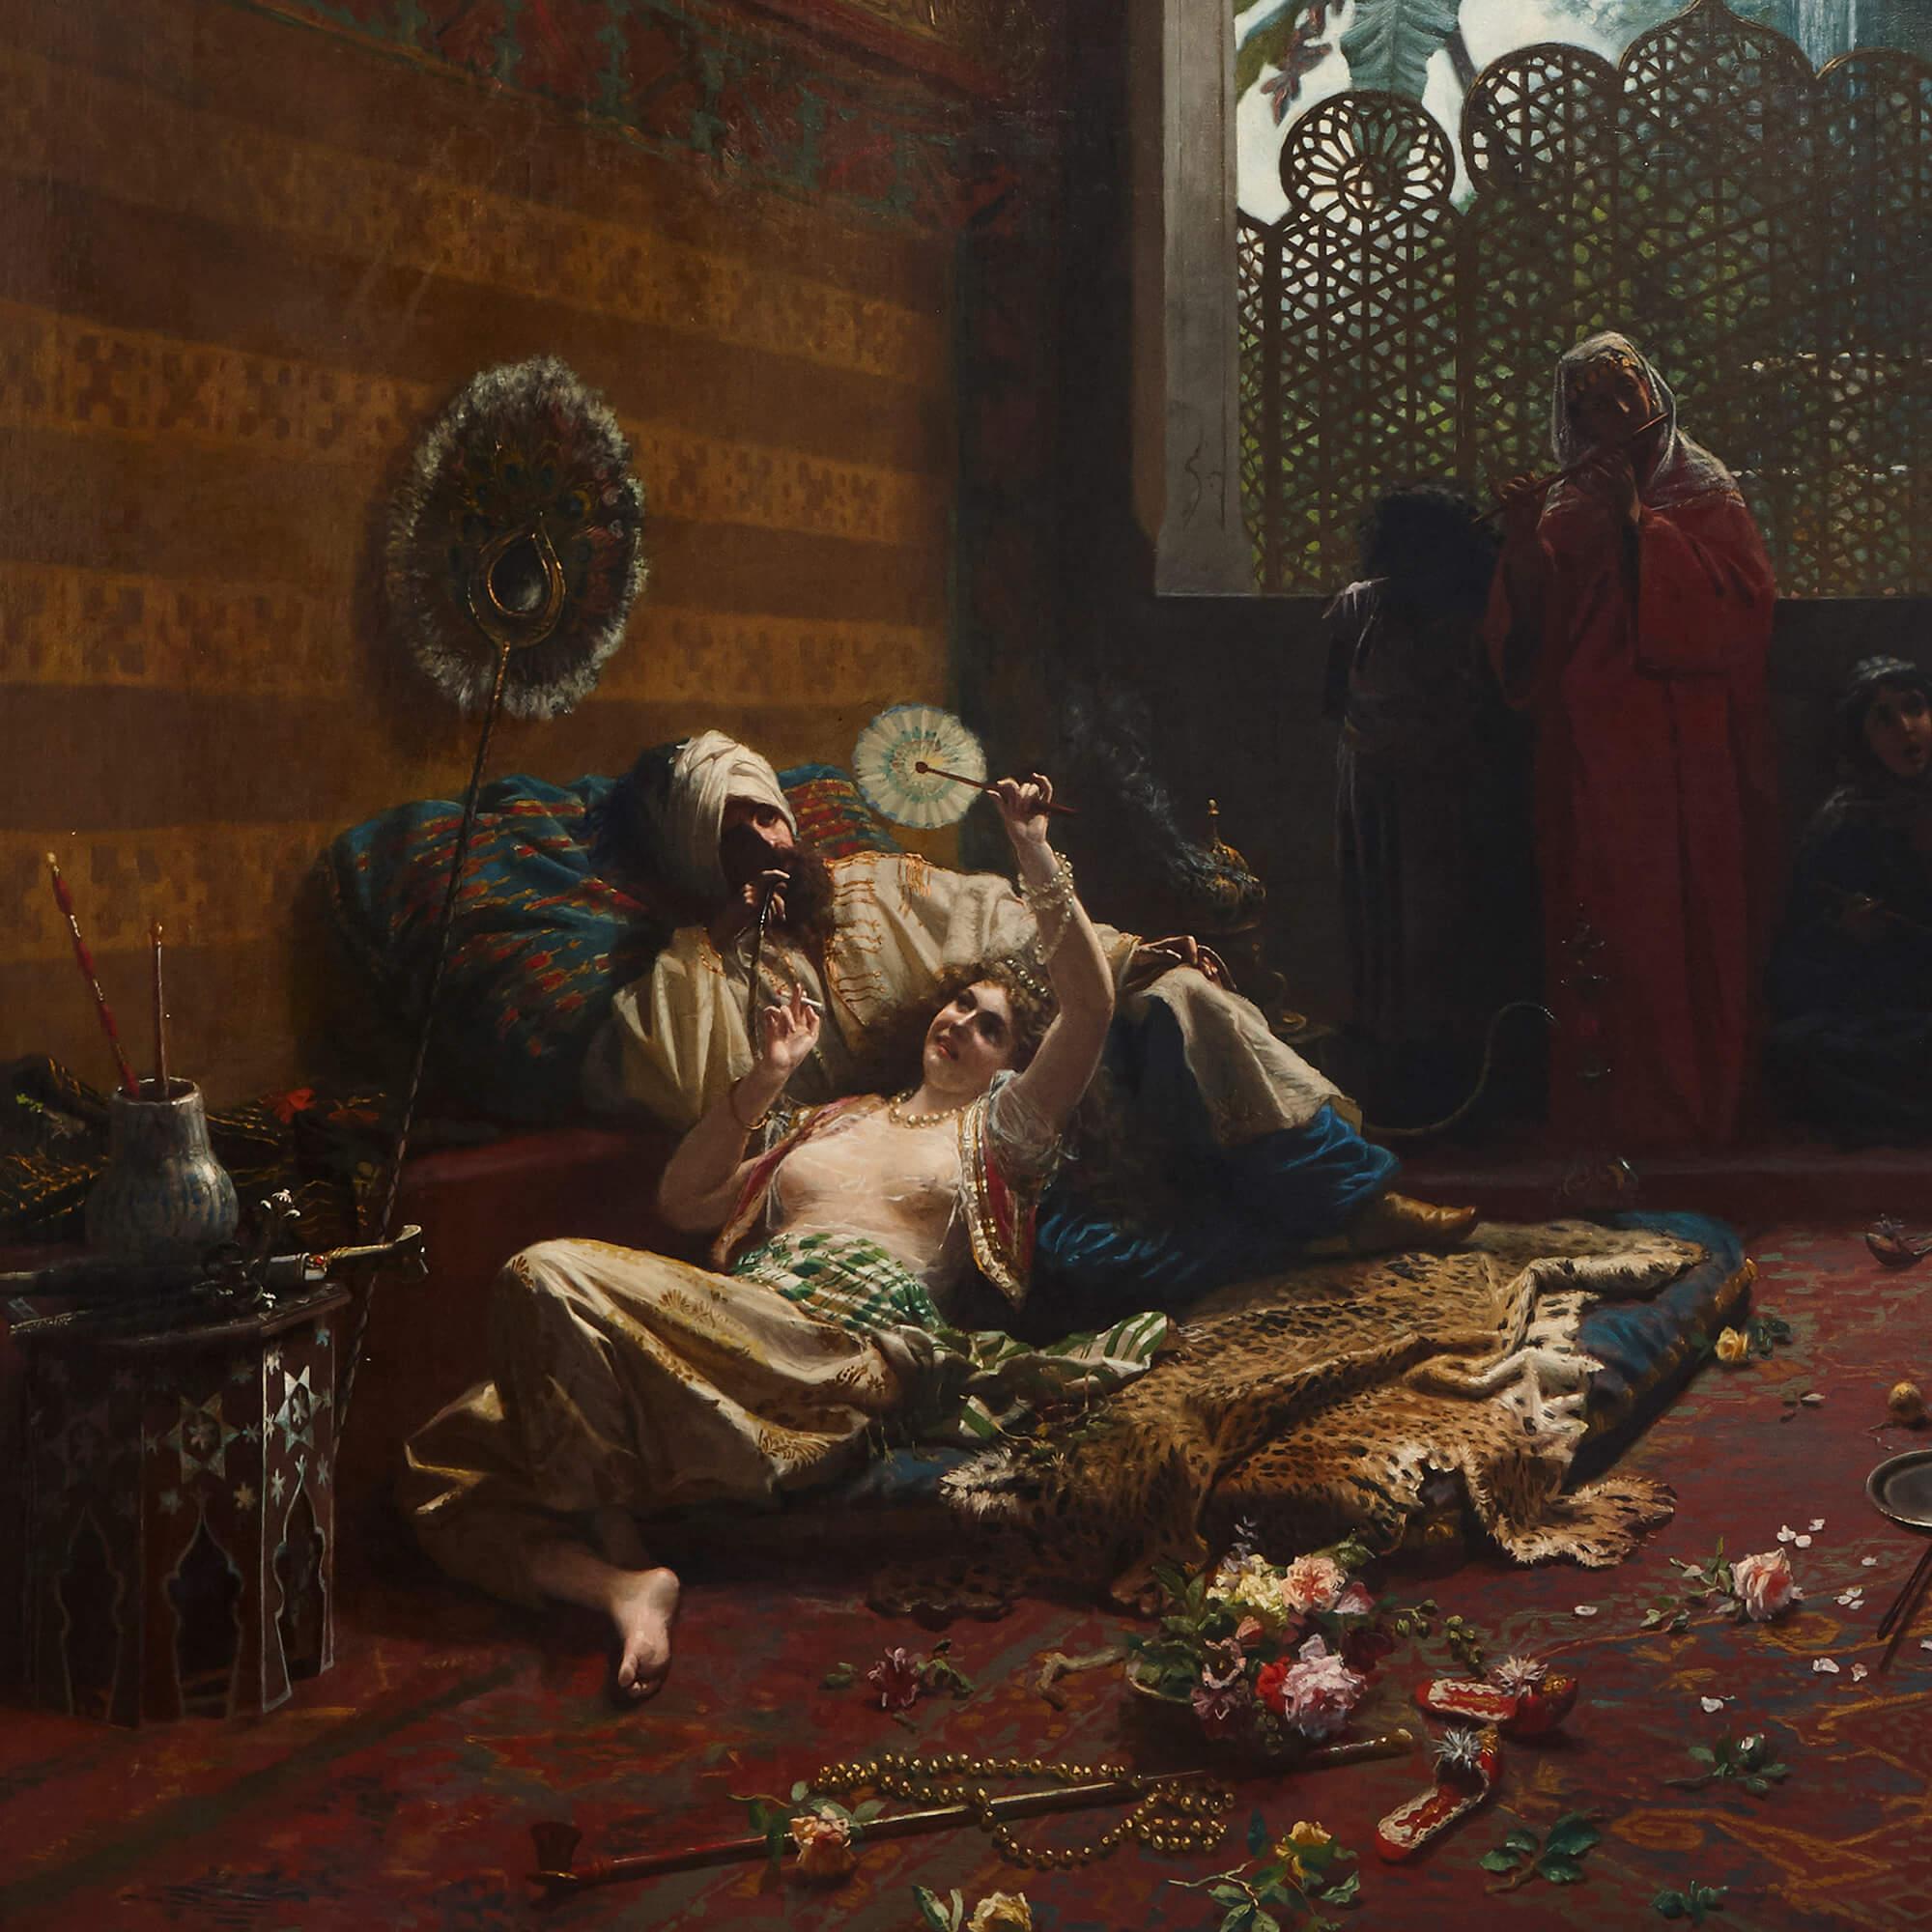 Large Italian Orientalist harem painting by Mantegazza